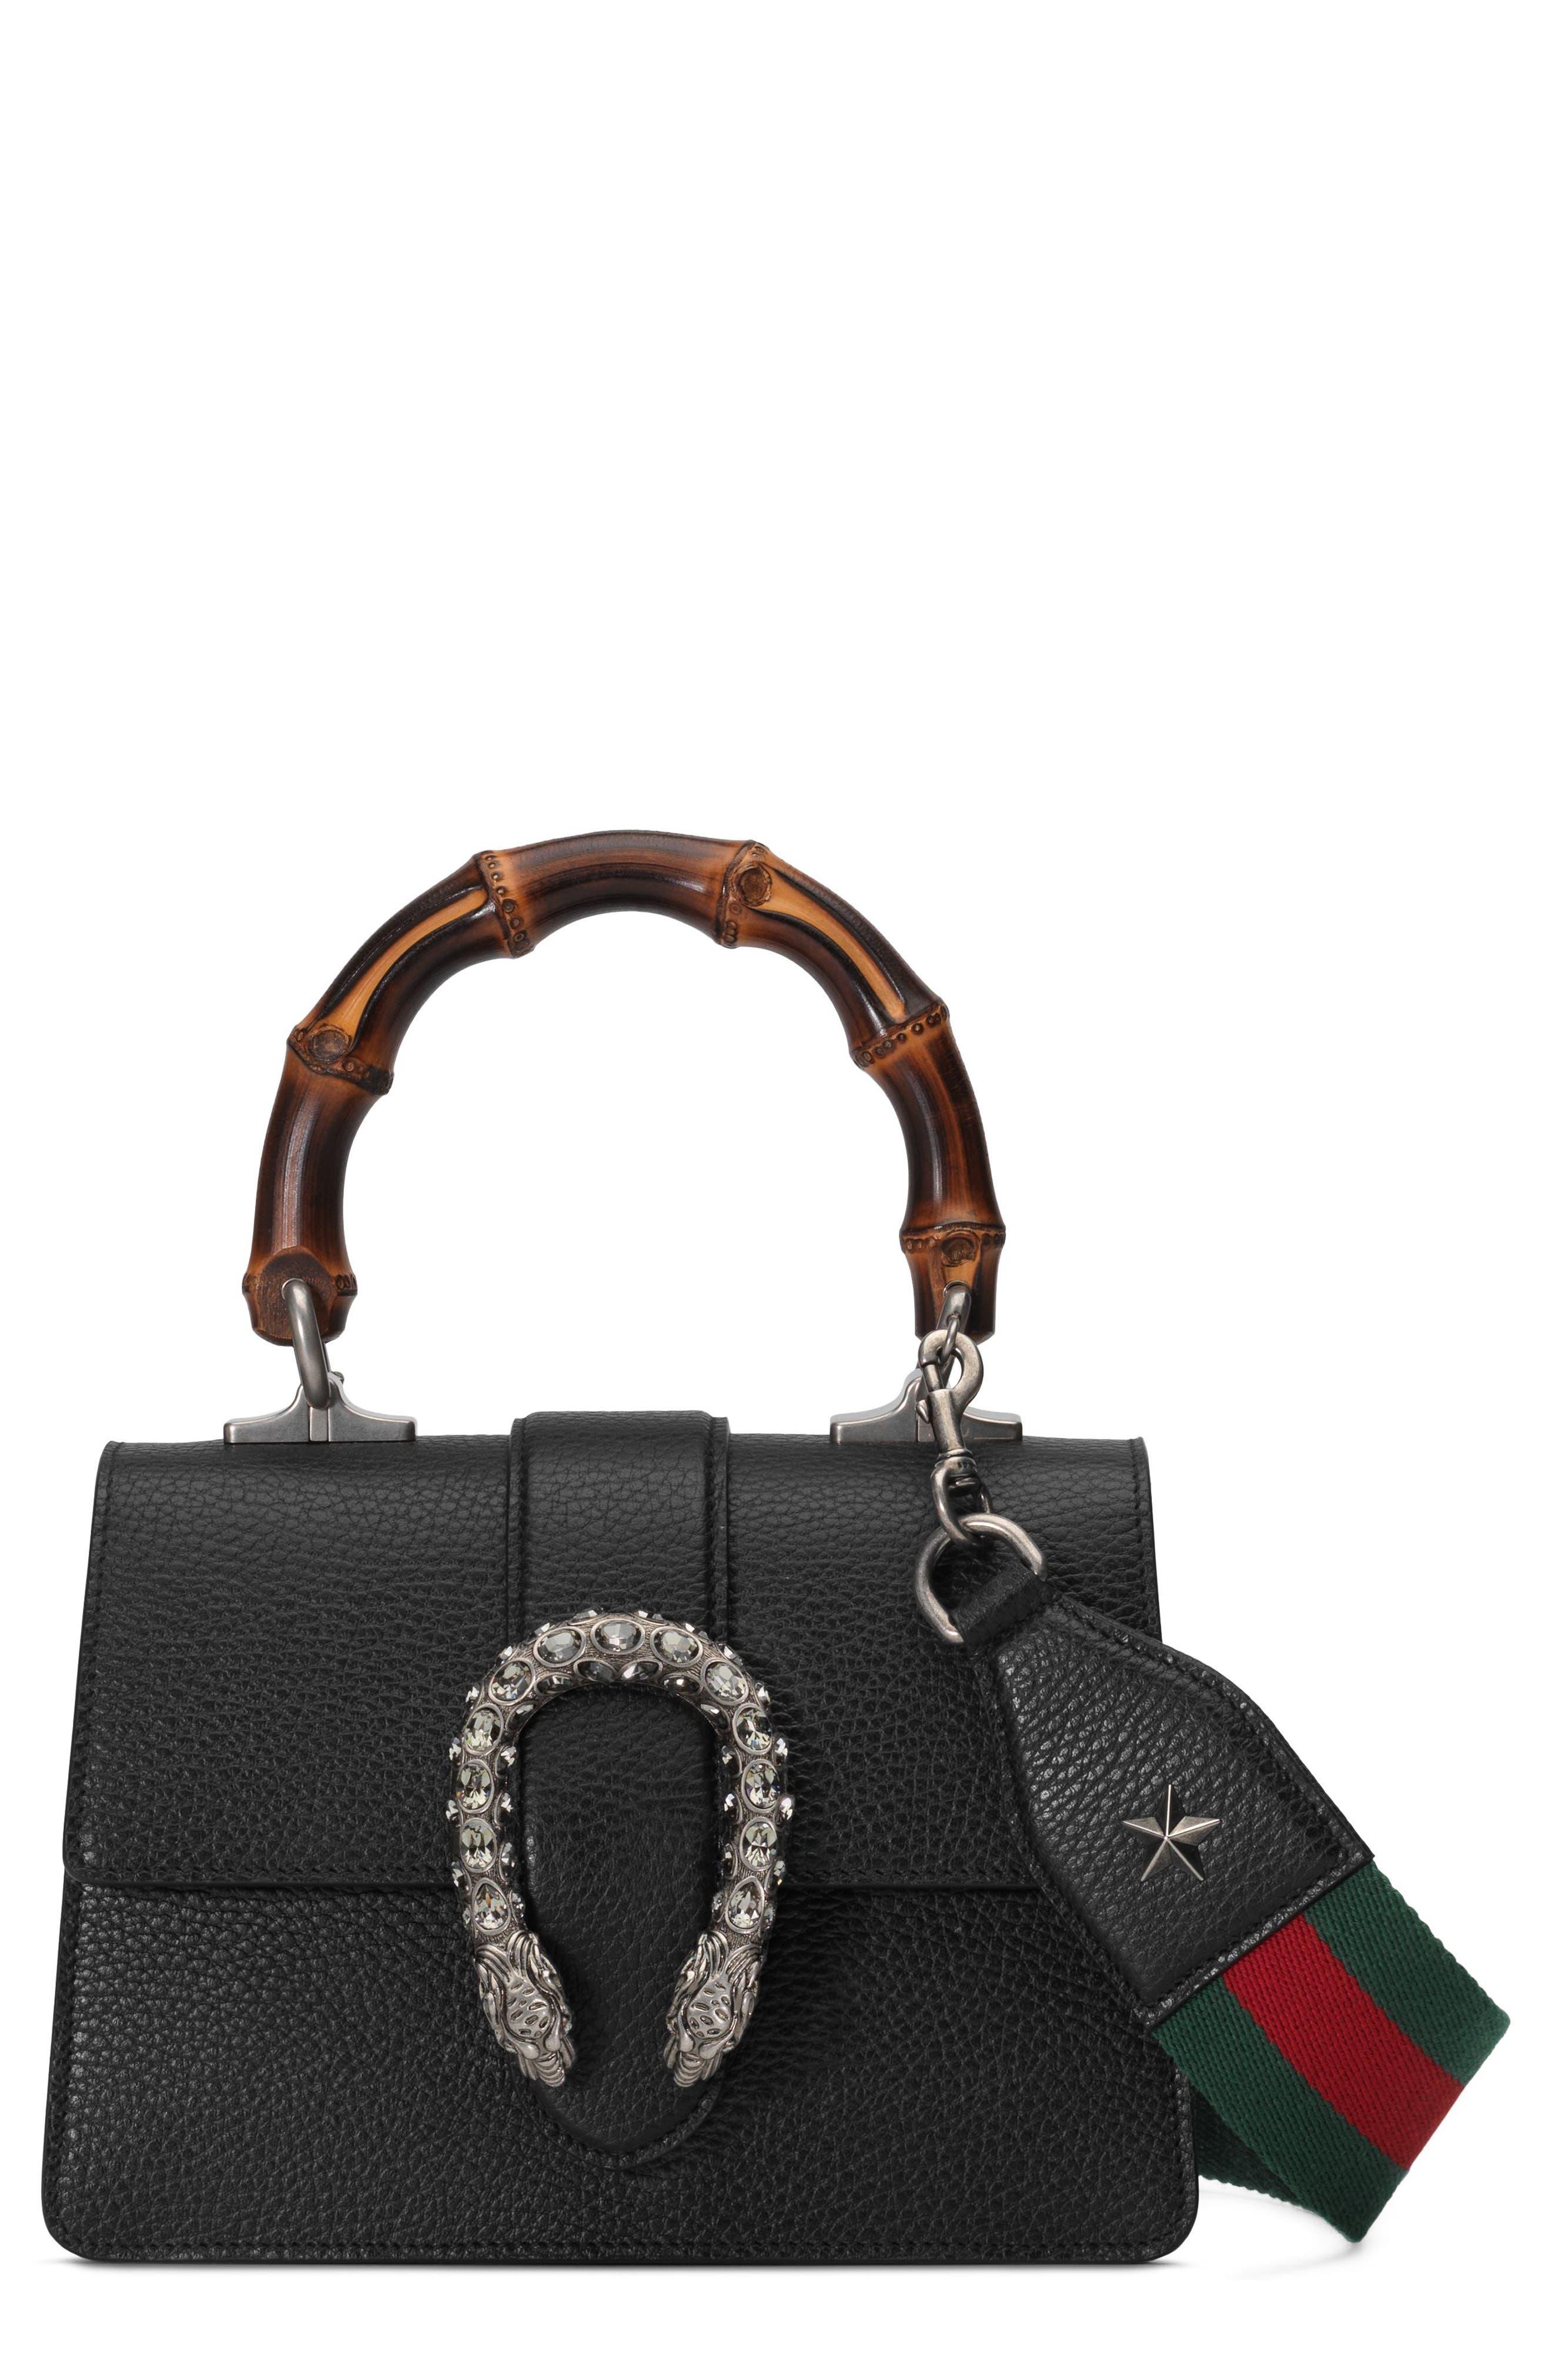 Mini Dionysus Leather Top Handle Satchel,                         Main,                         color, NERO/ VERT RED/ BLACK DIAMOND